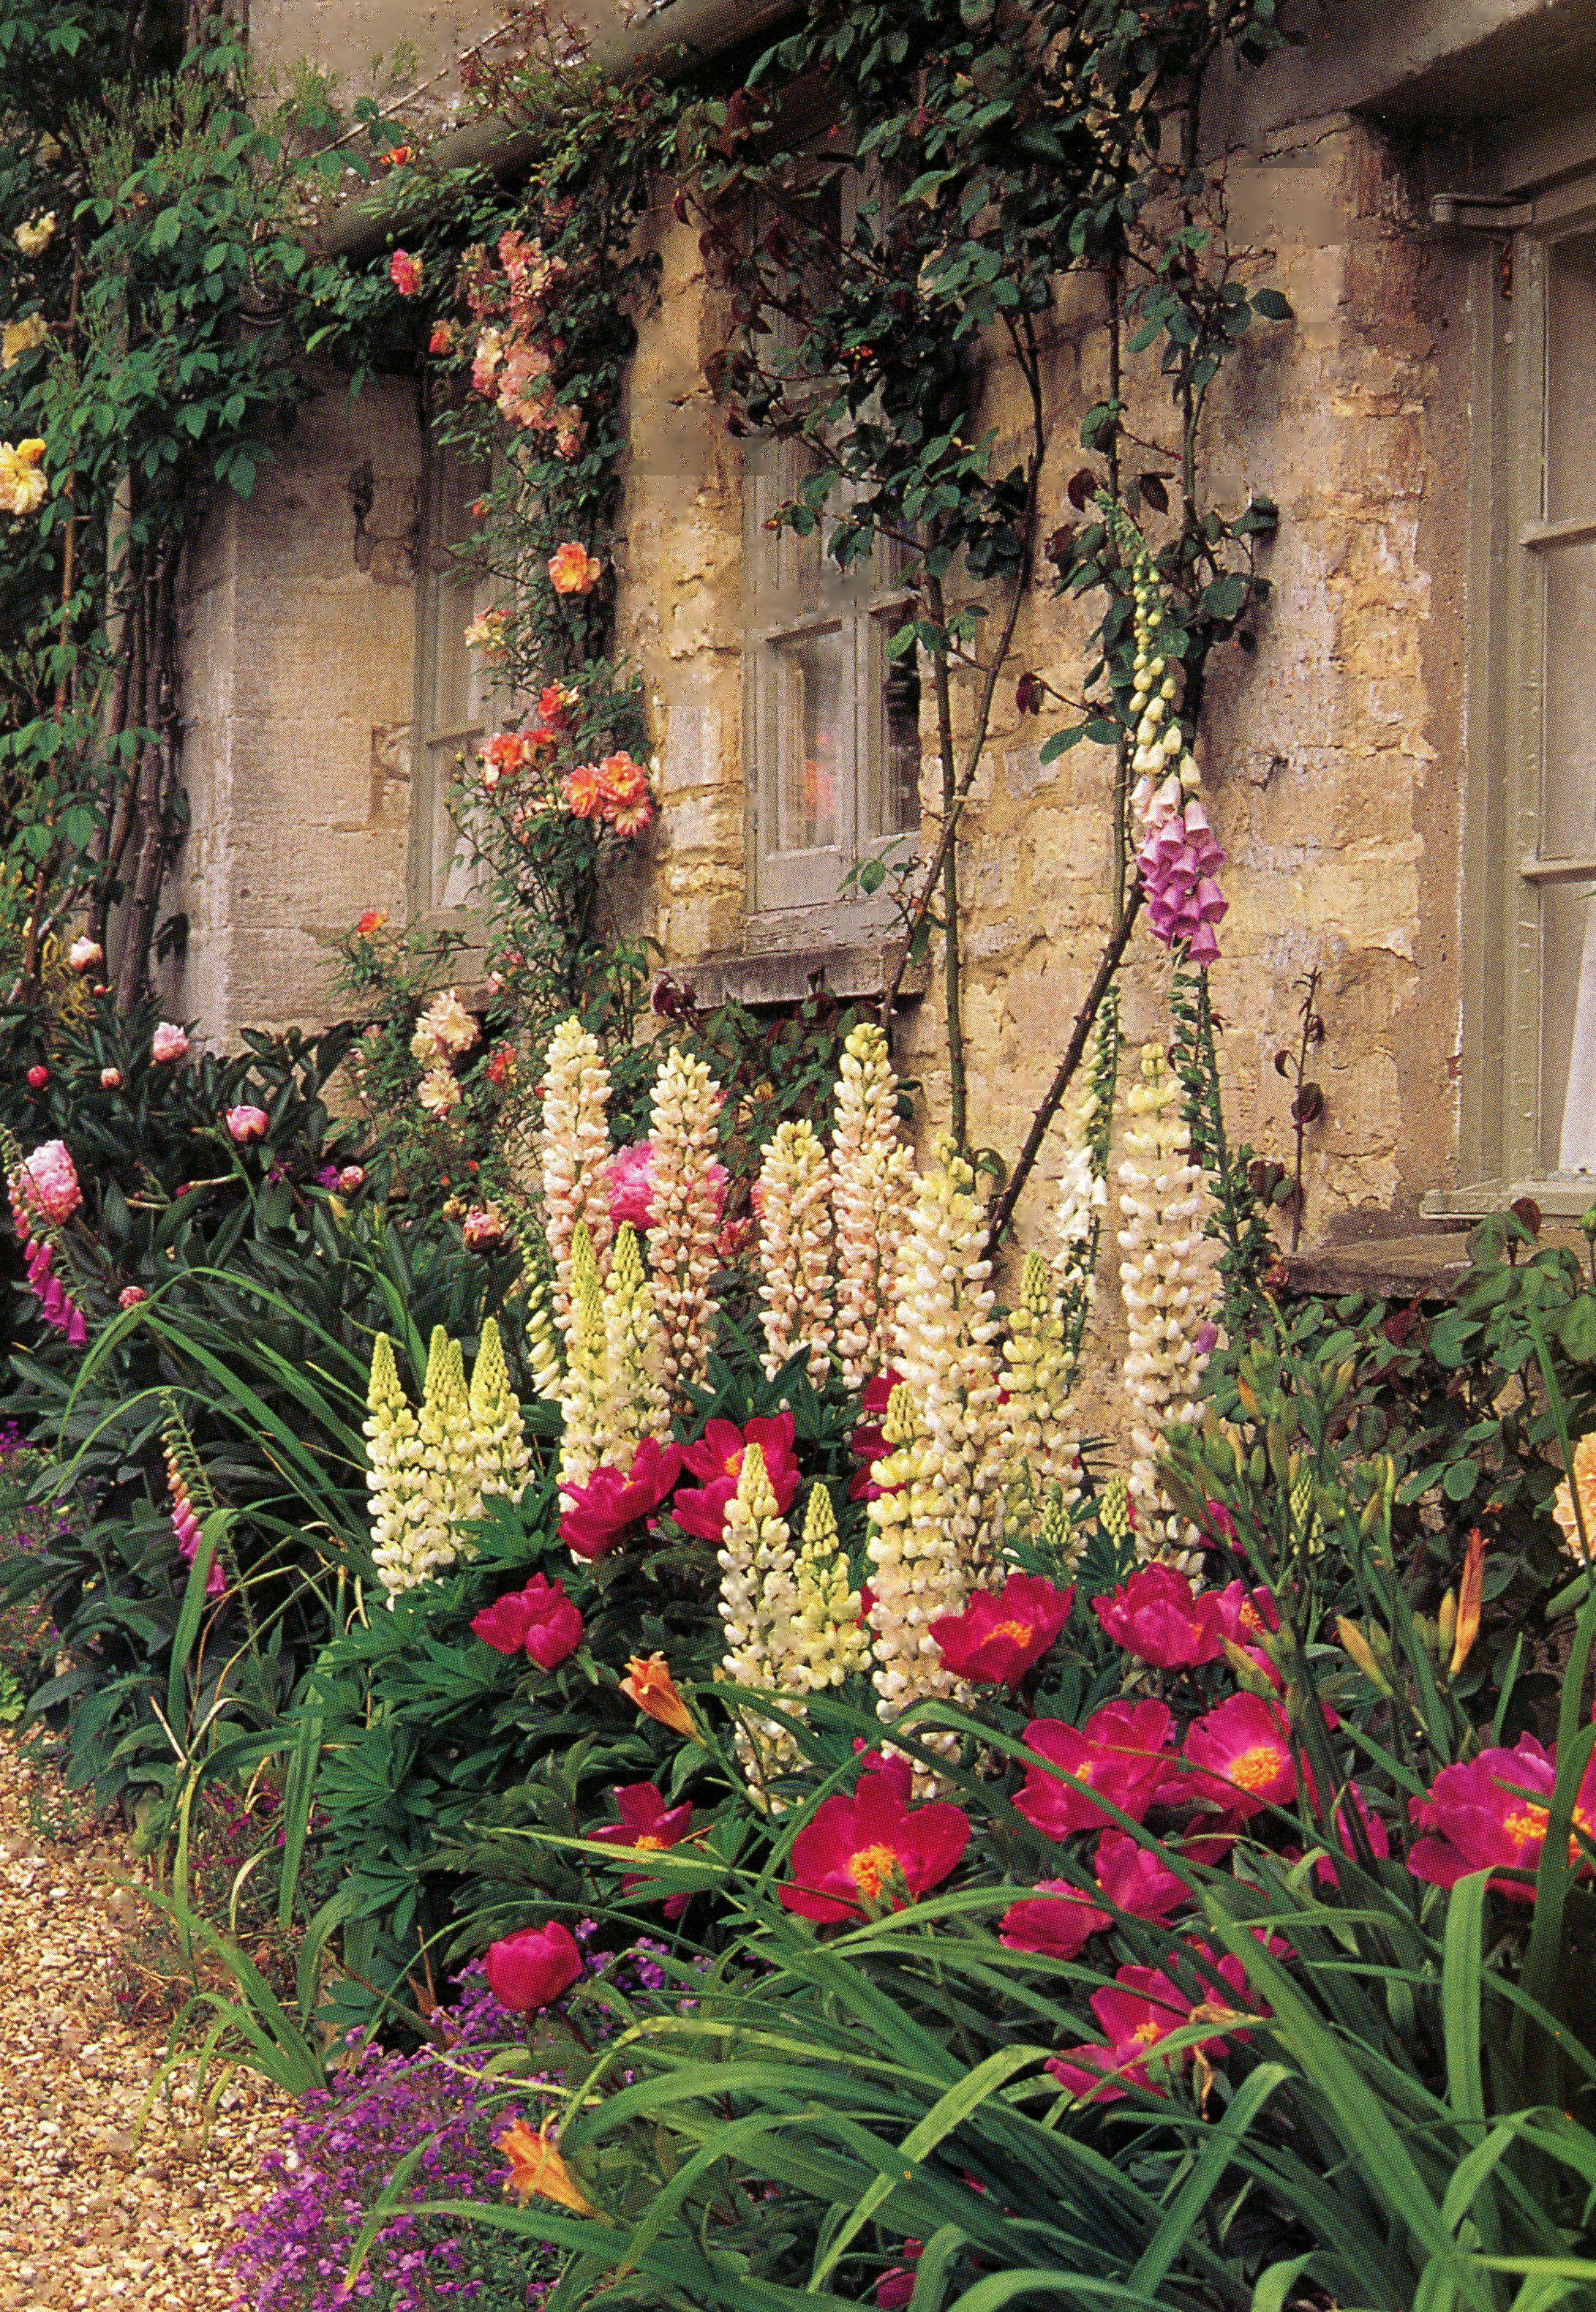 Pin by Janet Lohman on Gardens, Landscape   Pinterest   Gated ...